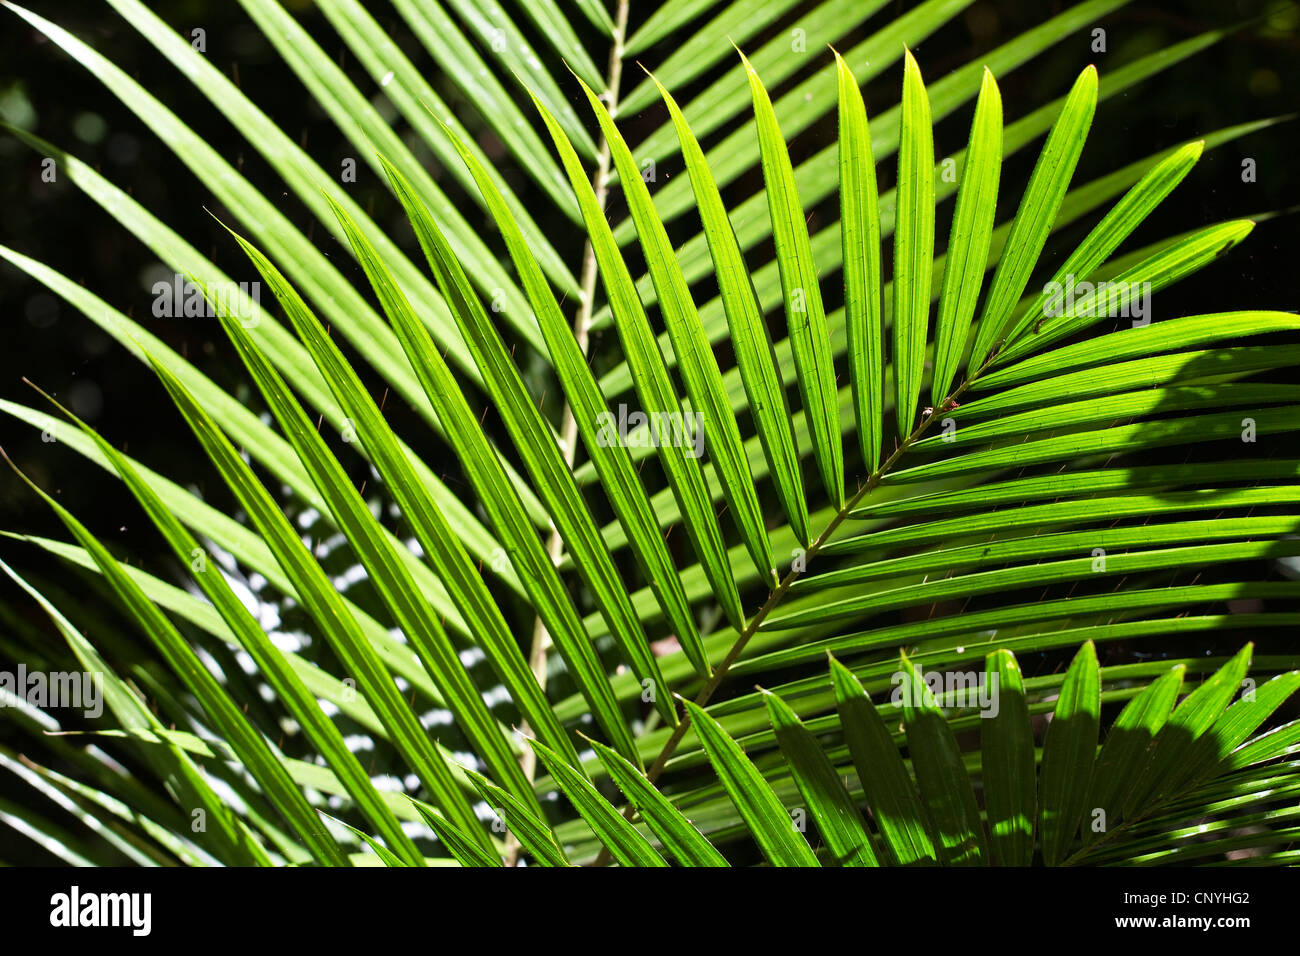 Viscious Hairy Mary (Calamus radicalis), leaves in backlight, Australia, Queensland, Atherton Tablelands - Stock Image